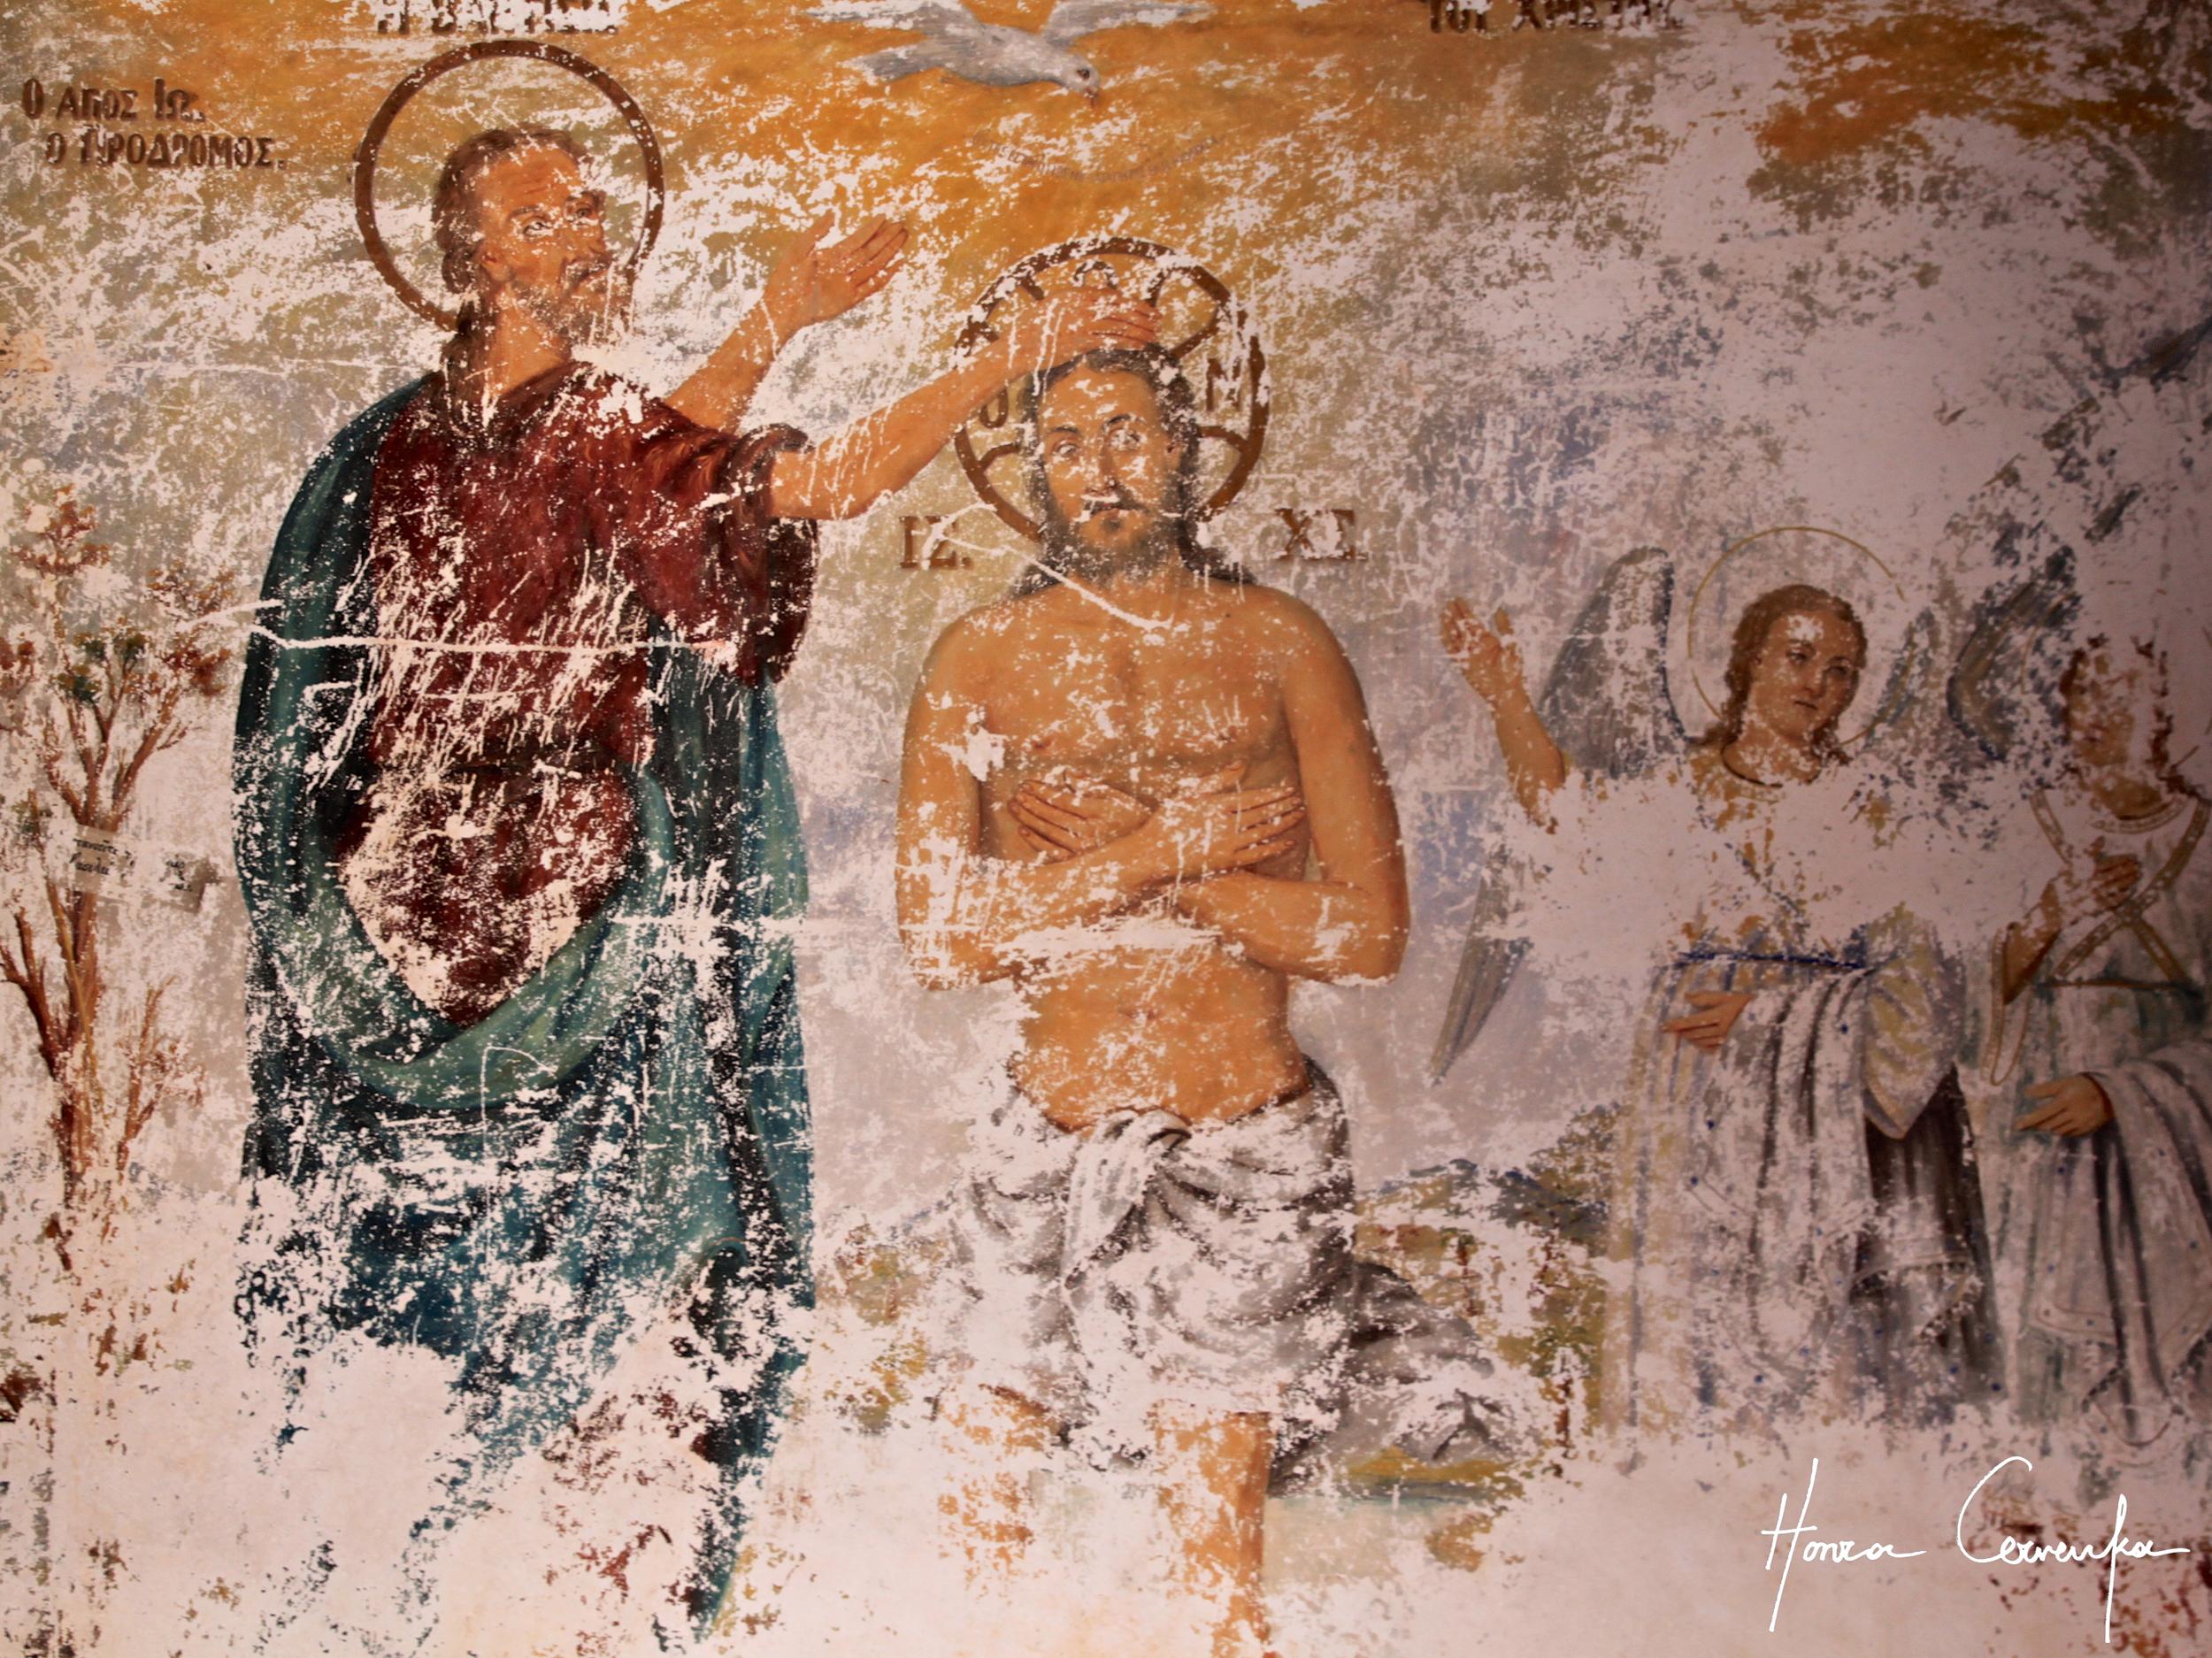 Greece-Patmos-Monastery-fresco2-Honza-Cervenka